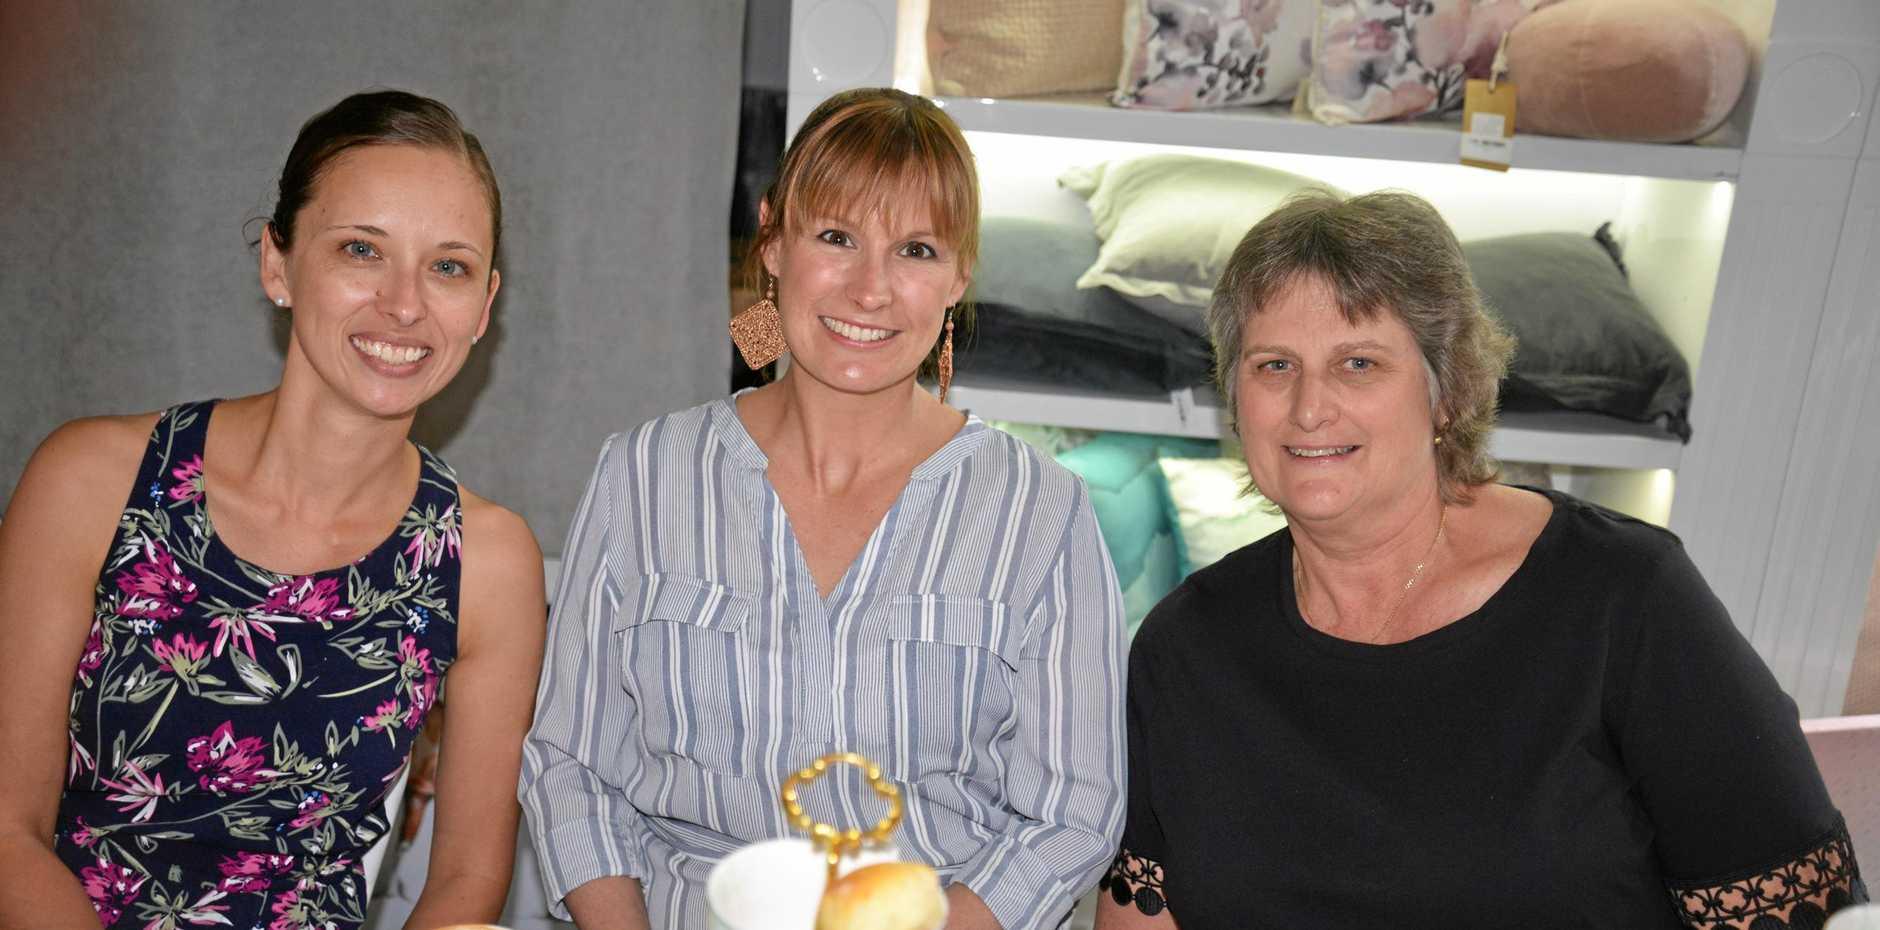 Angela O'Mara, Brooke McKenzie and Jenny Watt at Little Gallery Café.